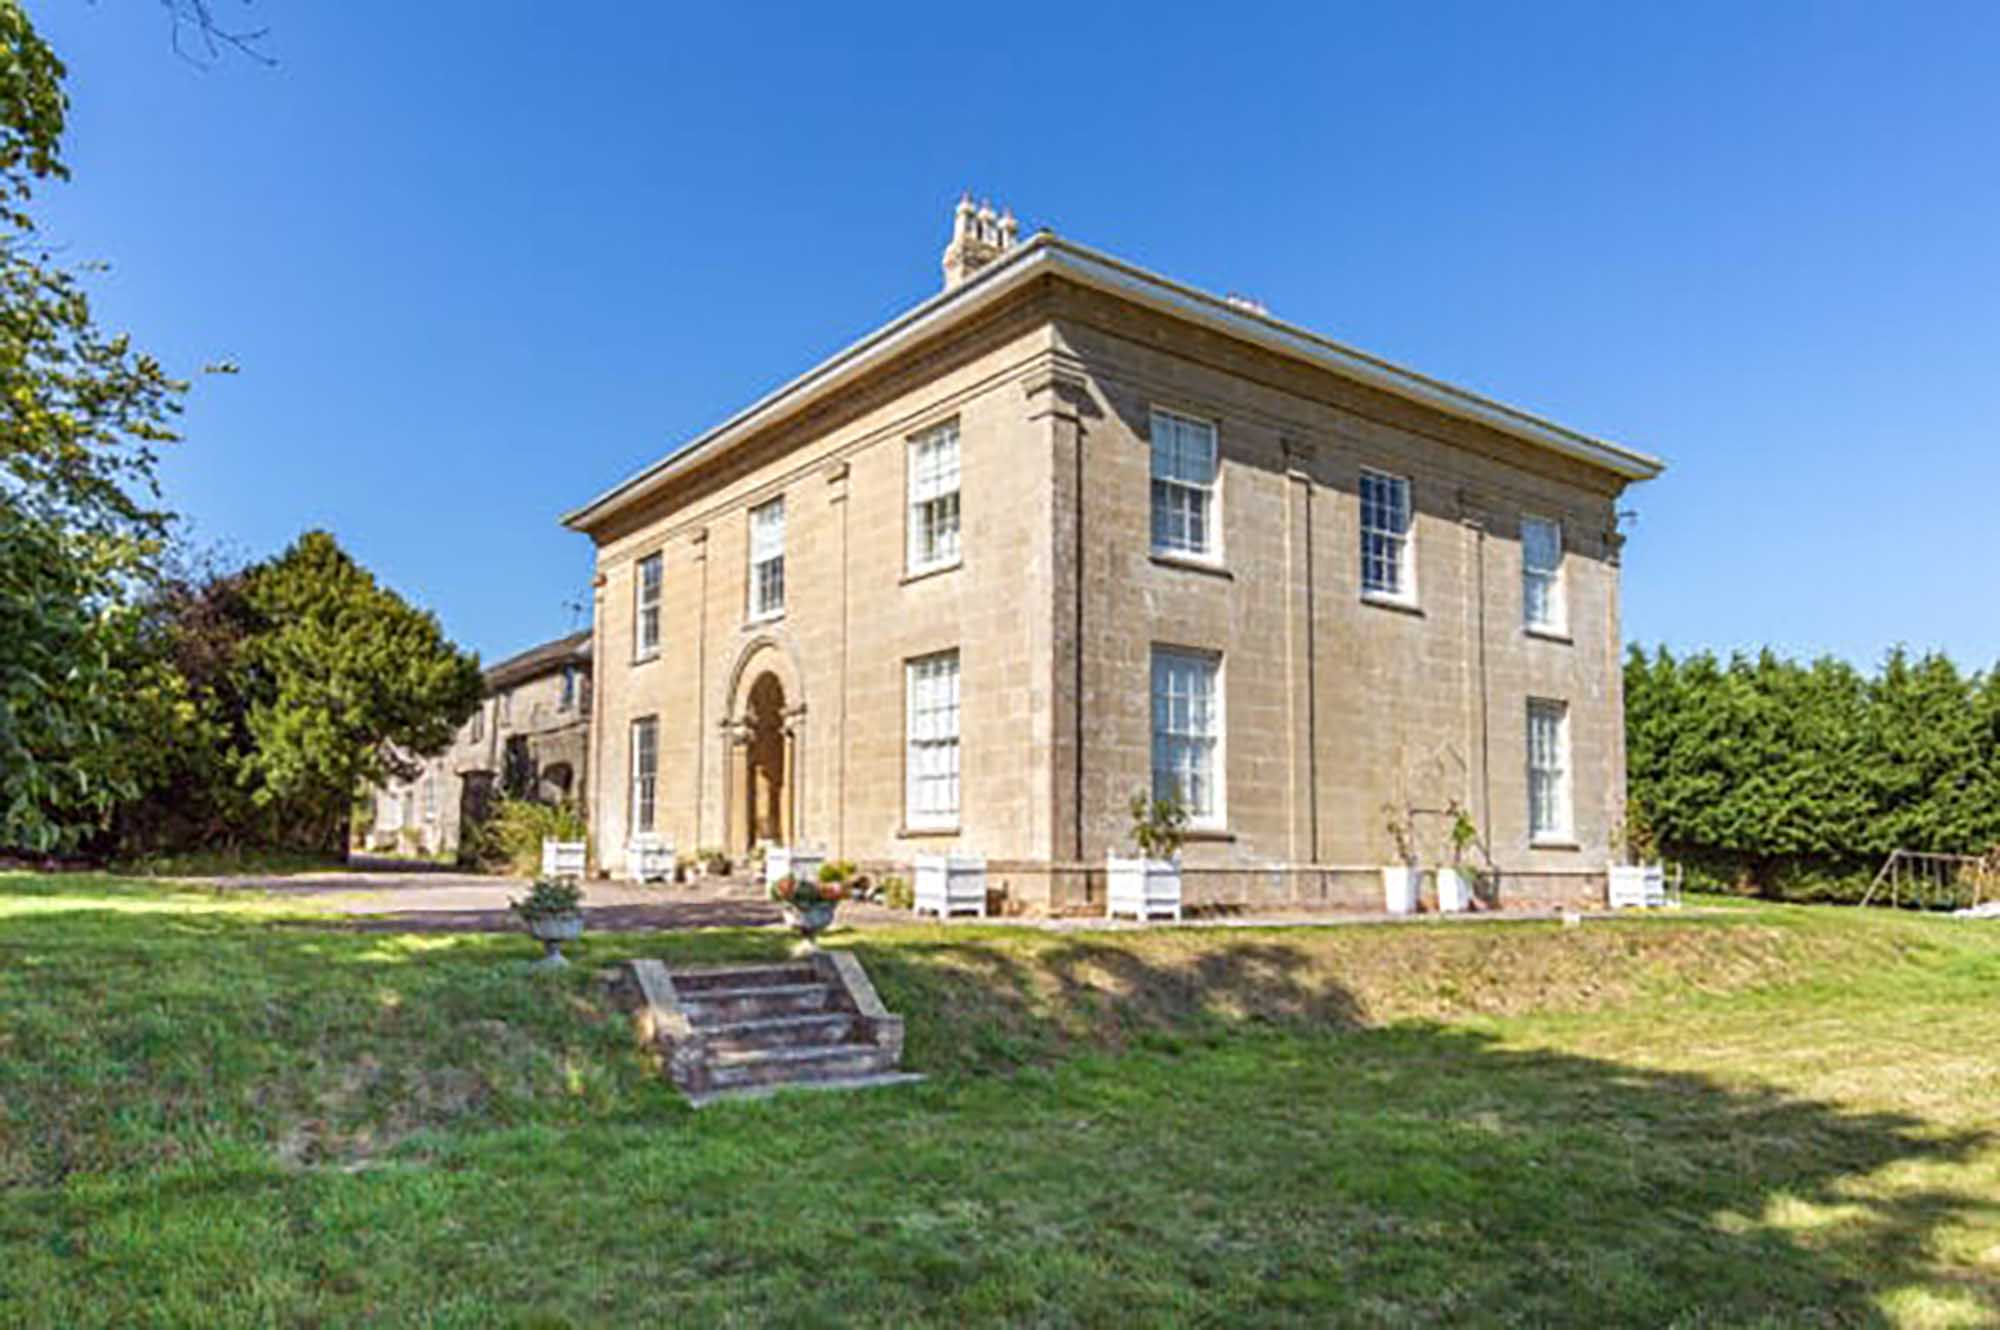 Lockhill Hall – Large Georgian House, land, cottages